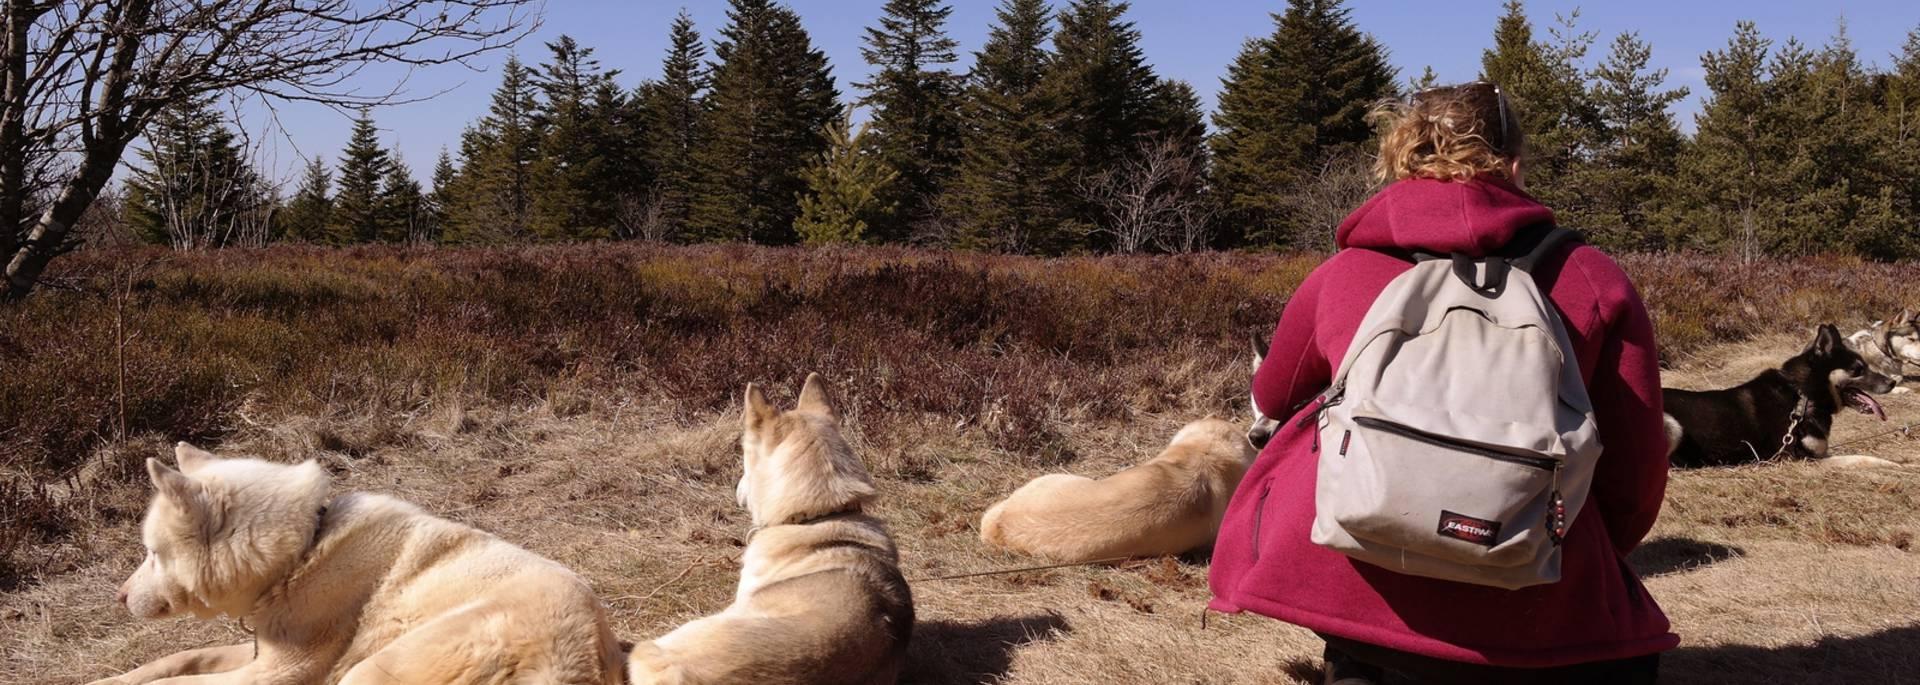 husky cani rando randonnee chien chiens huskies traineau pilat experience temoignage avis crets kimudjuk